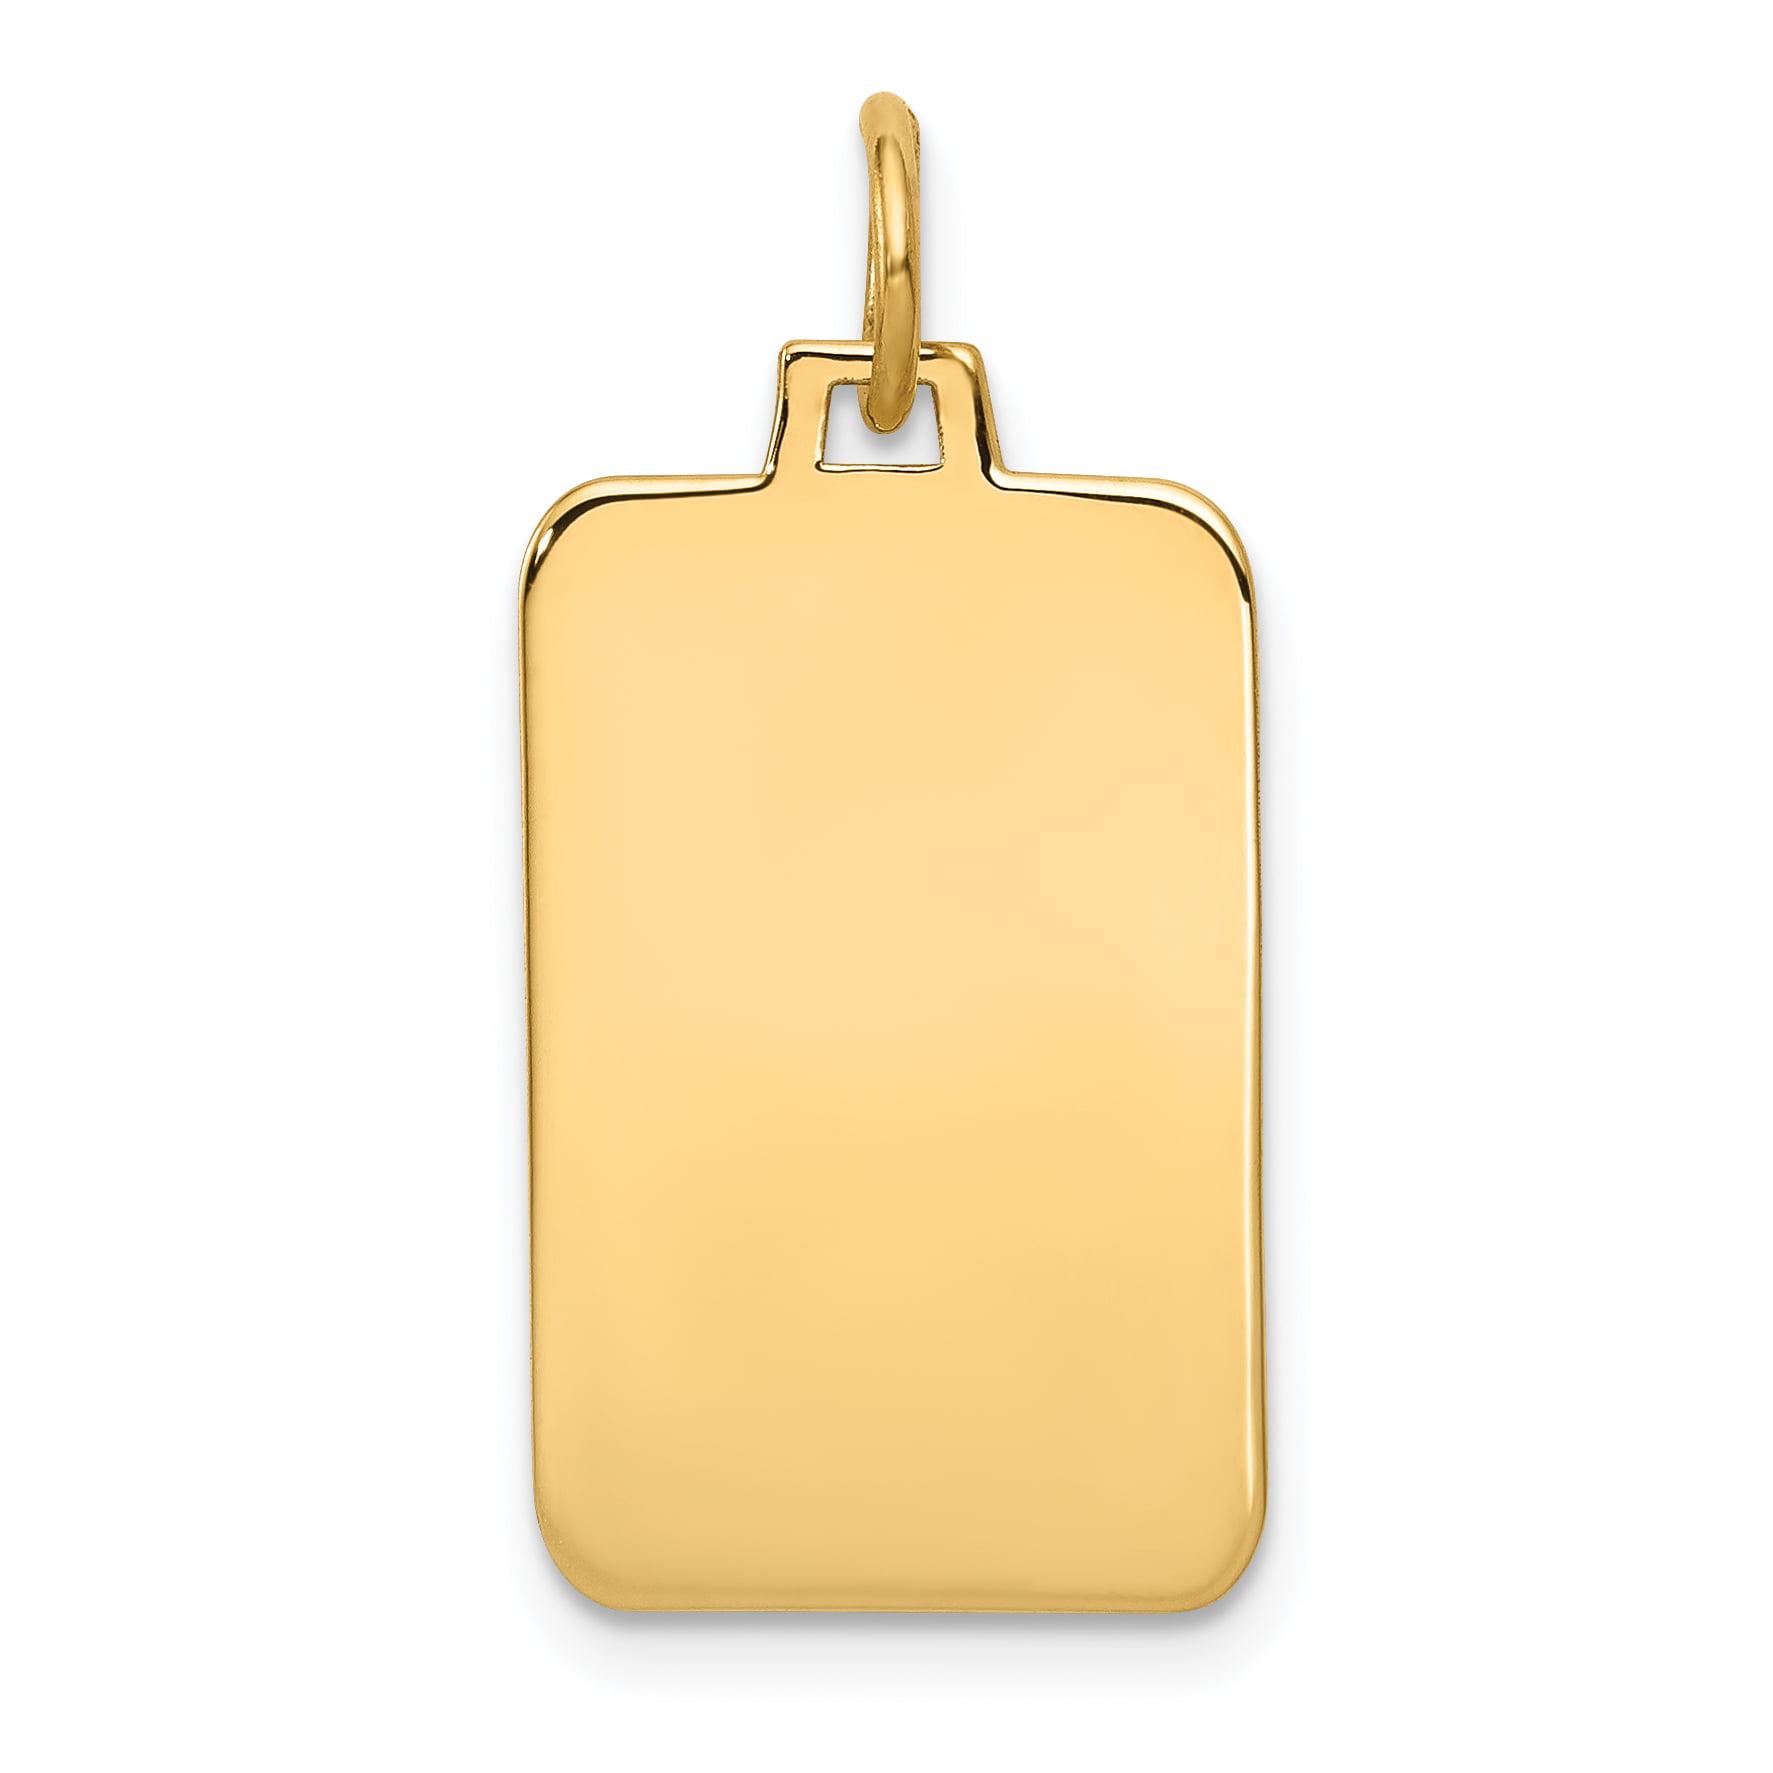 14K Yellow Gold Plain .035 Gauge Engravable Rectangular Disc Charm